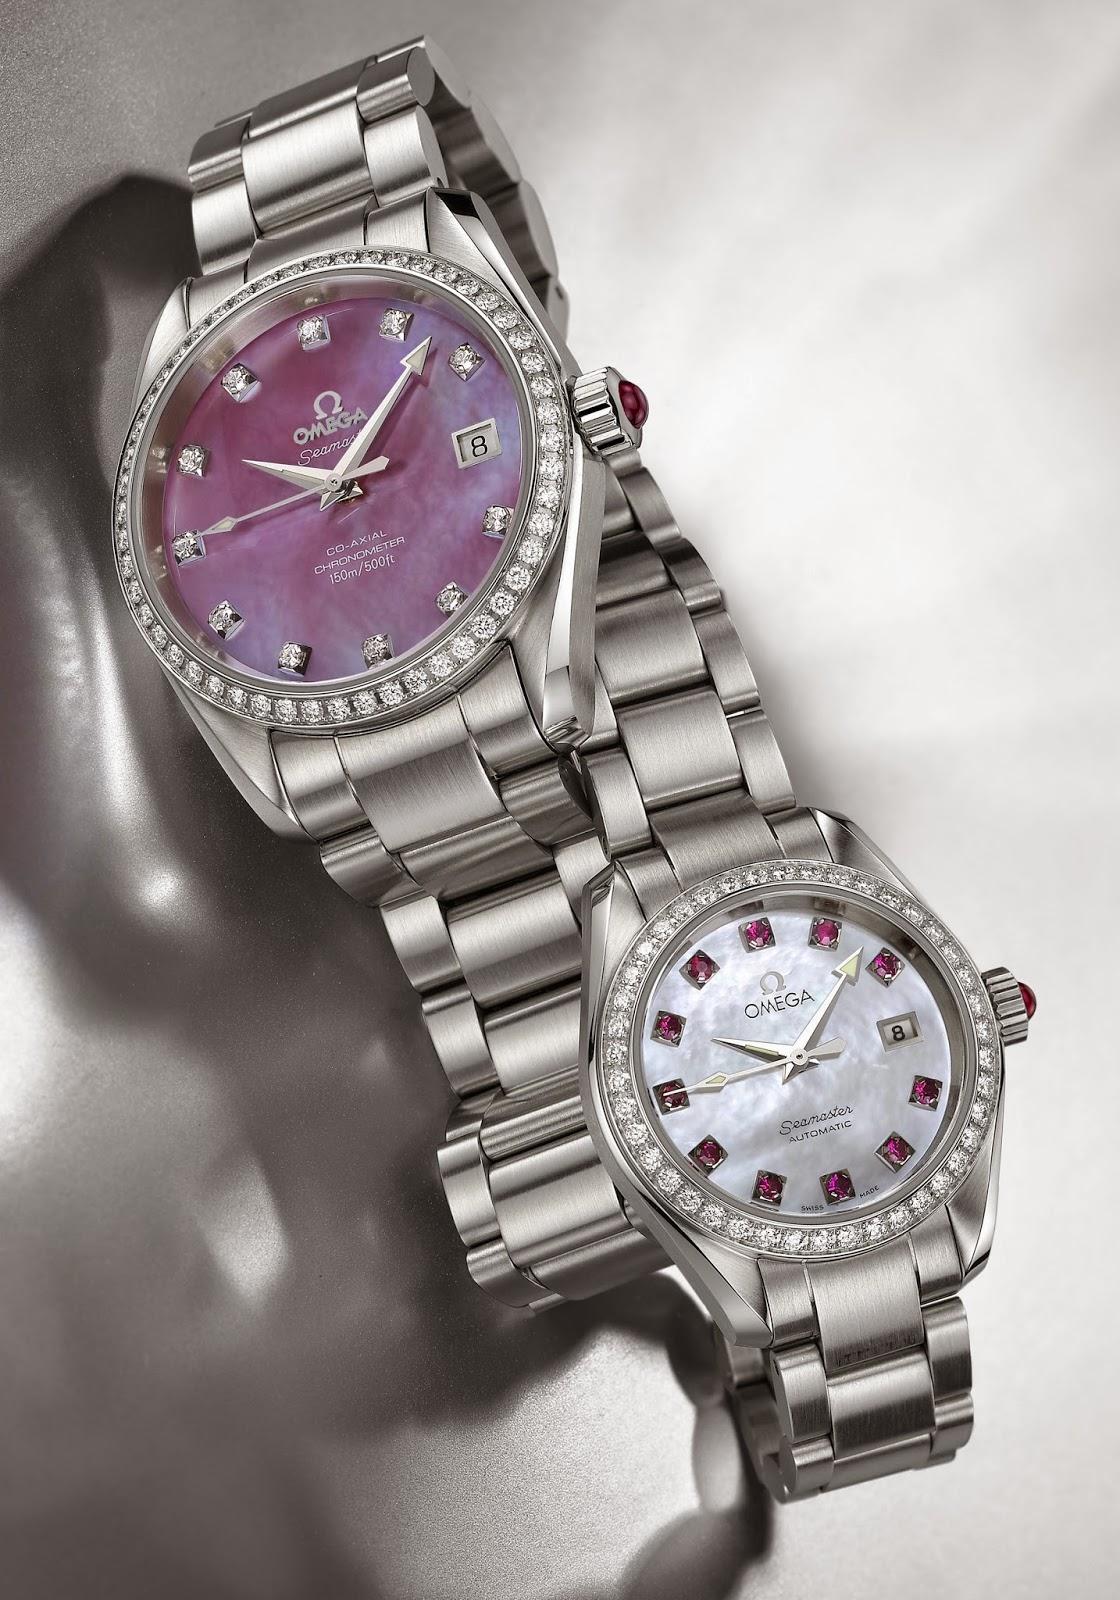 Omega Seamaster Aqua Terra Jewellery watch